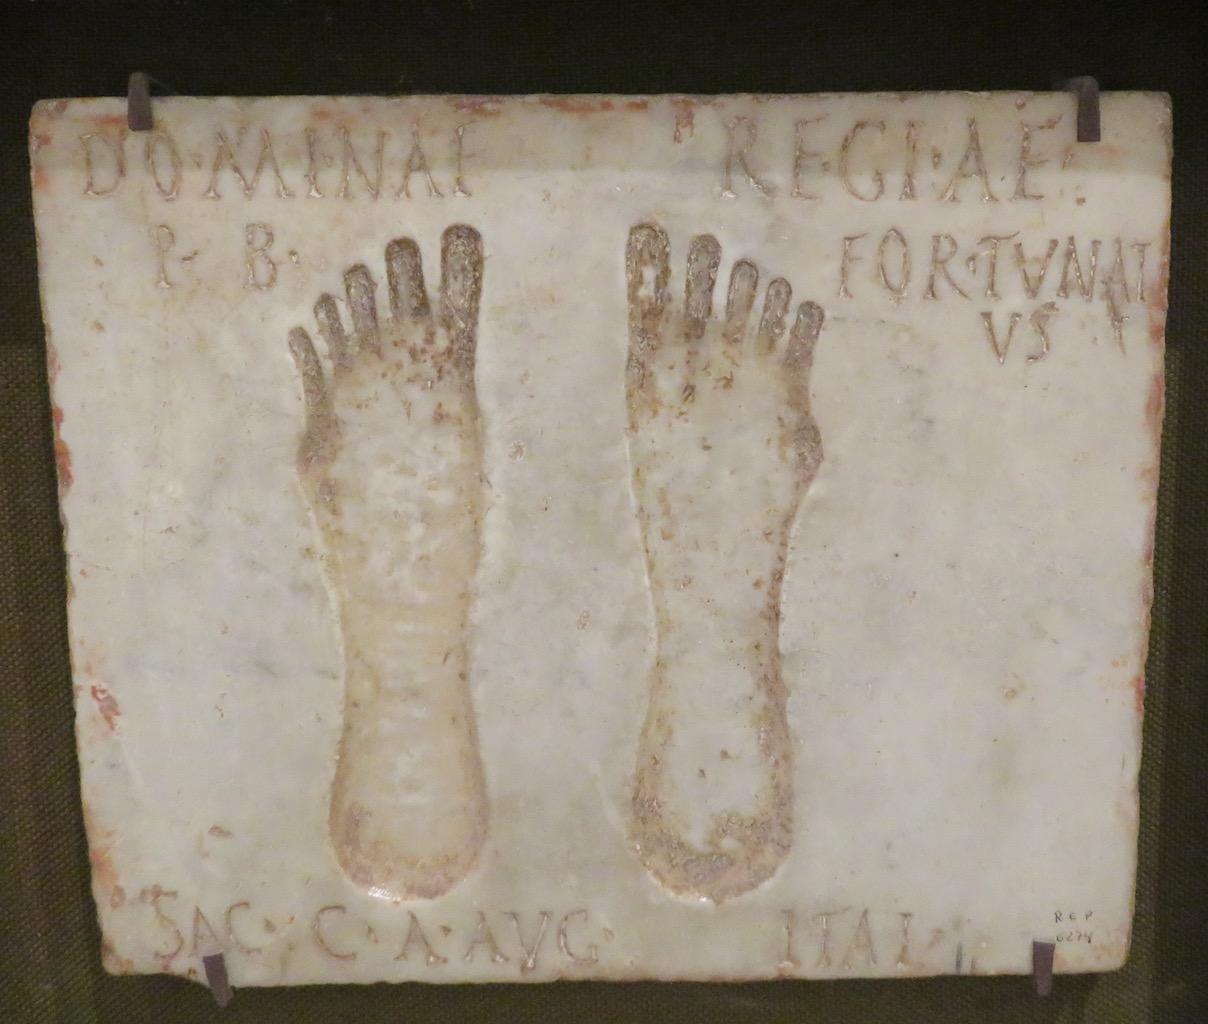 99-sevilla-arch-museum-footprints-copy